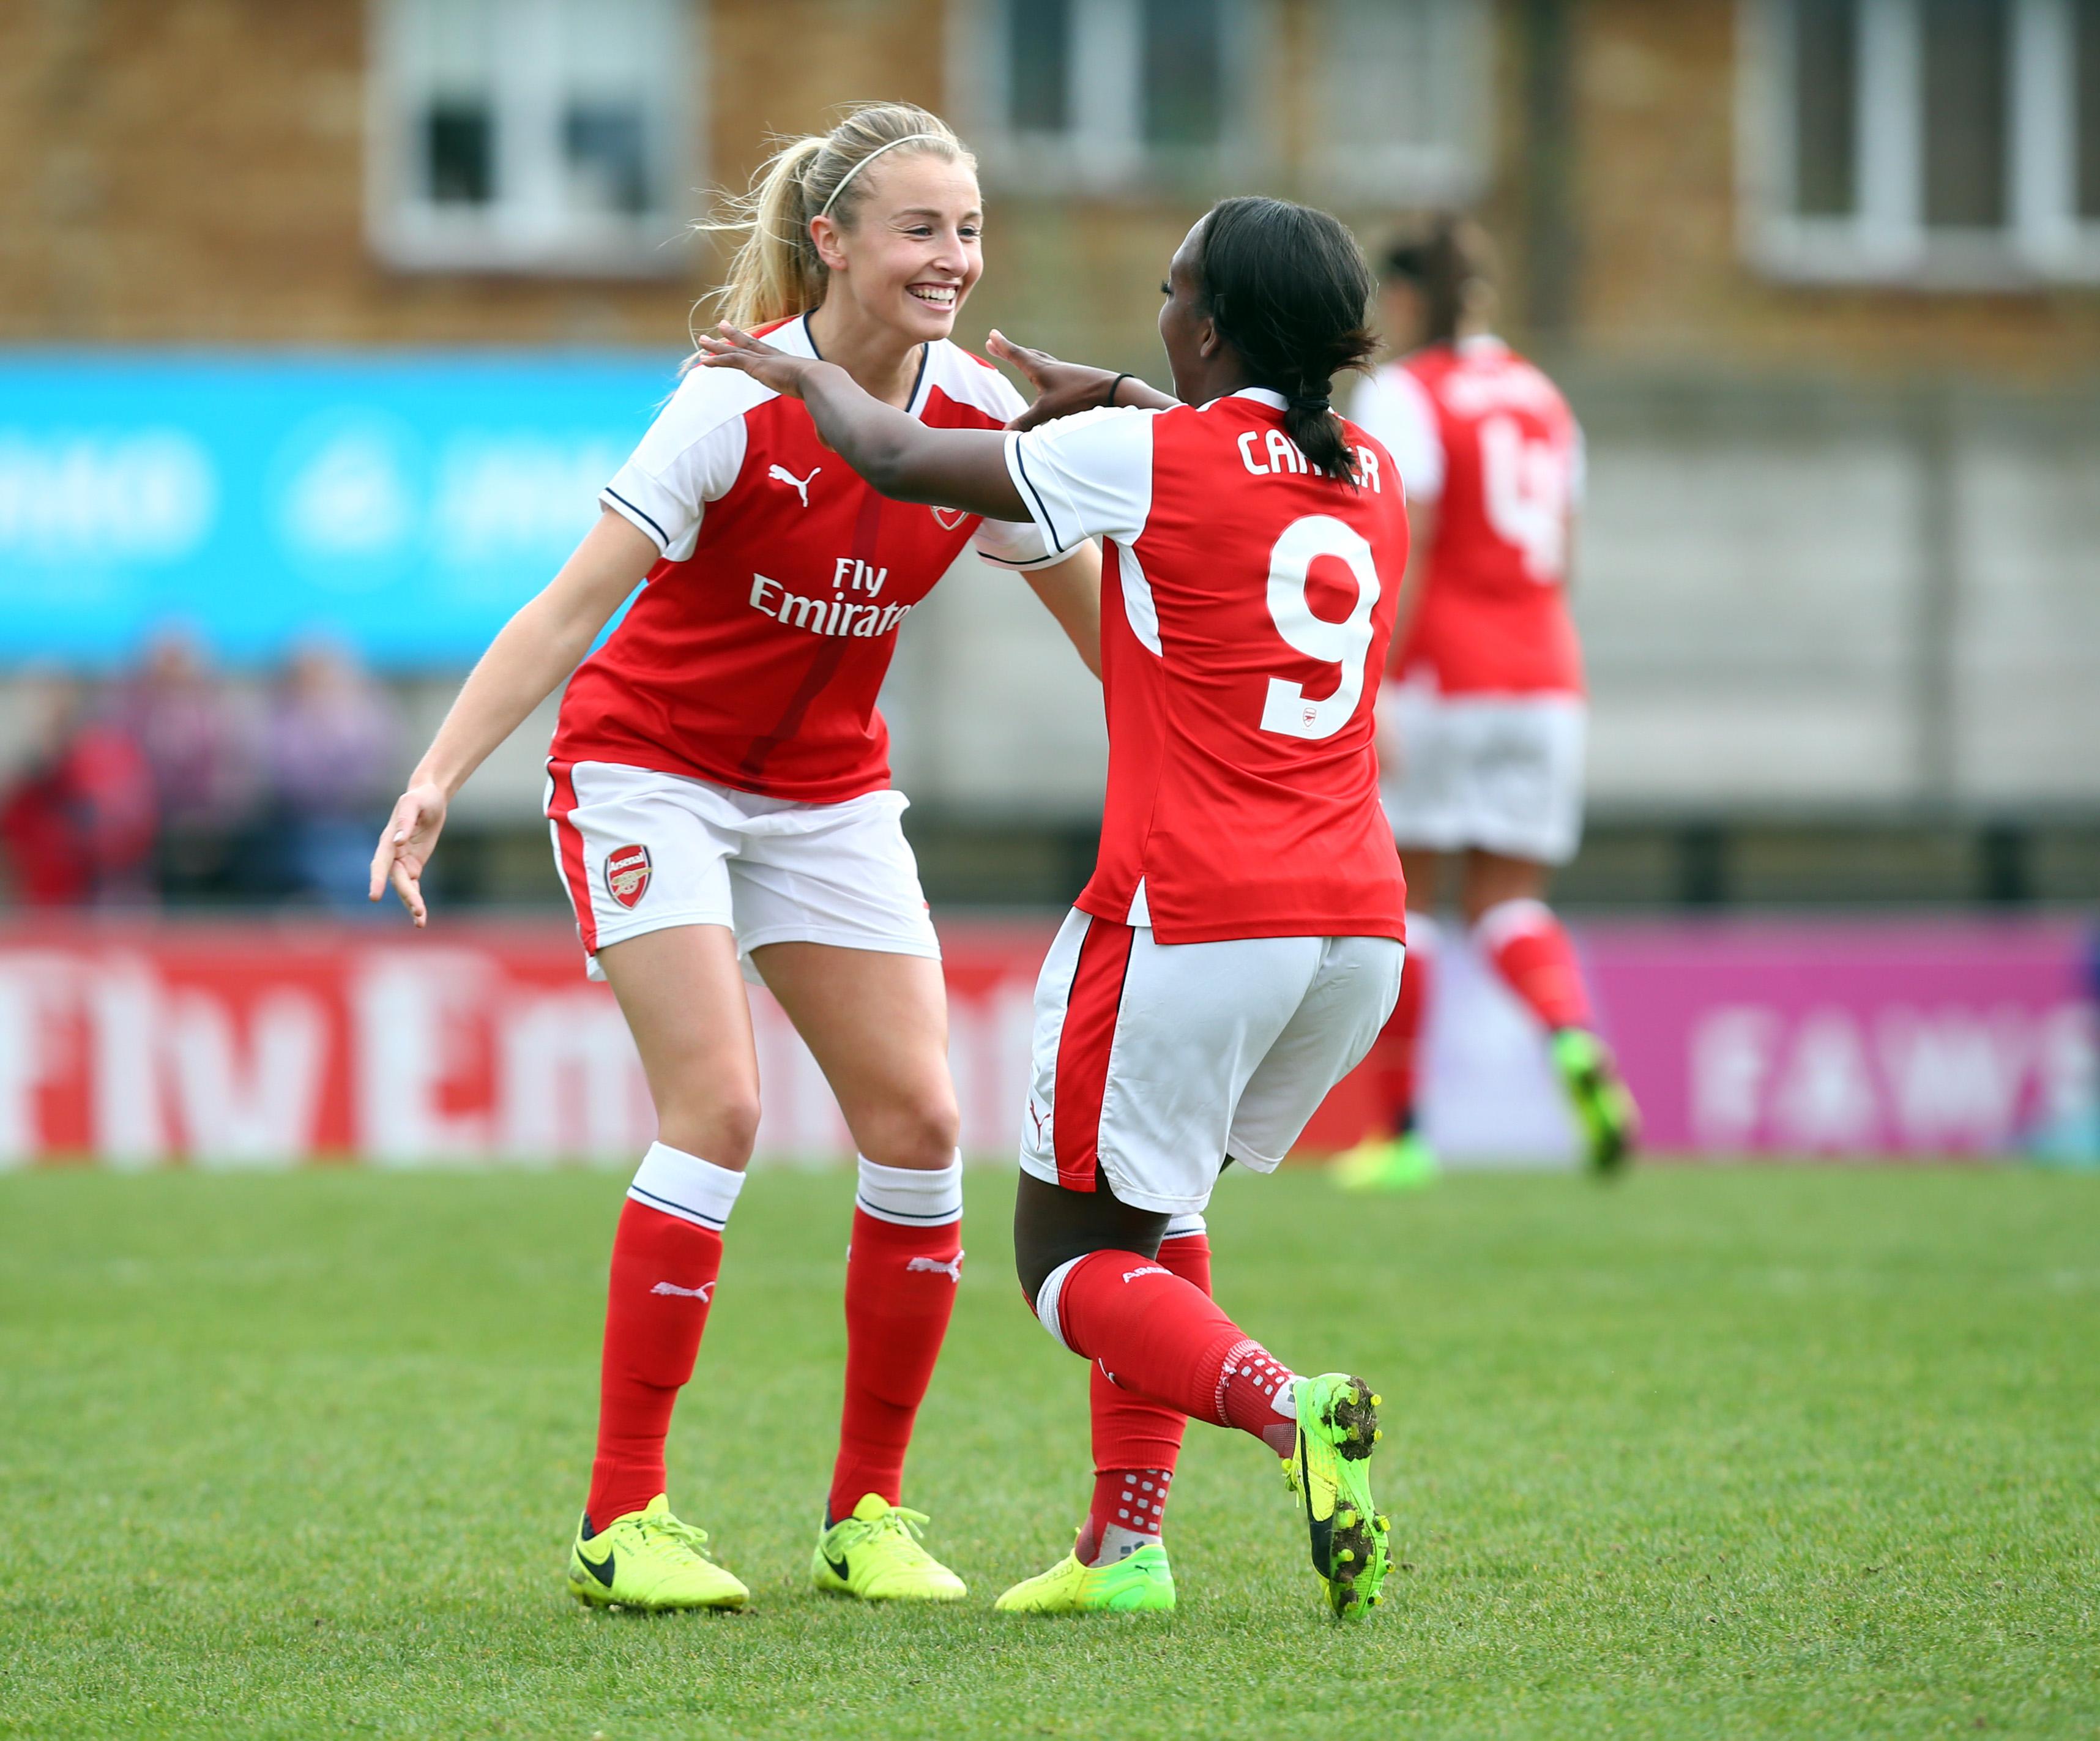 Arsenal v Tottenham Hotspur - SSE FA Women's Cup